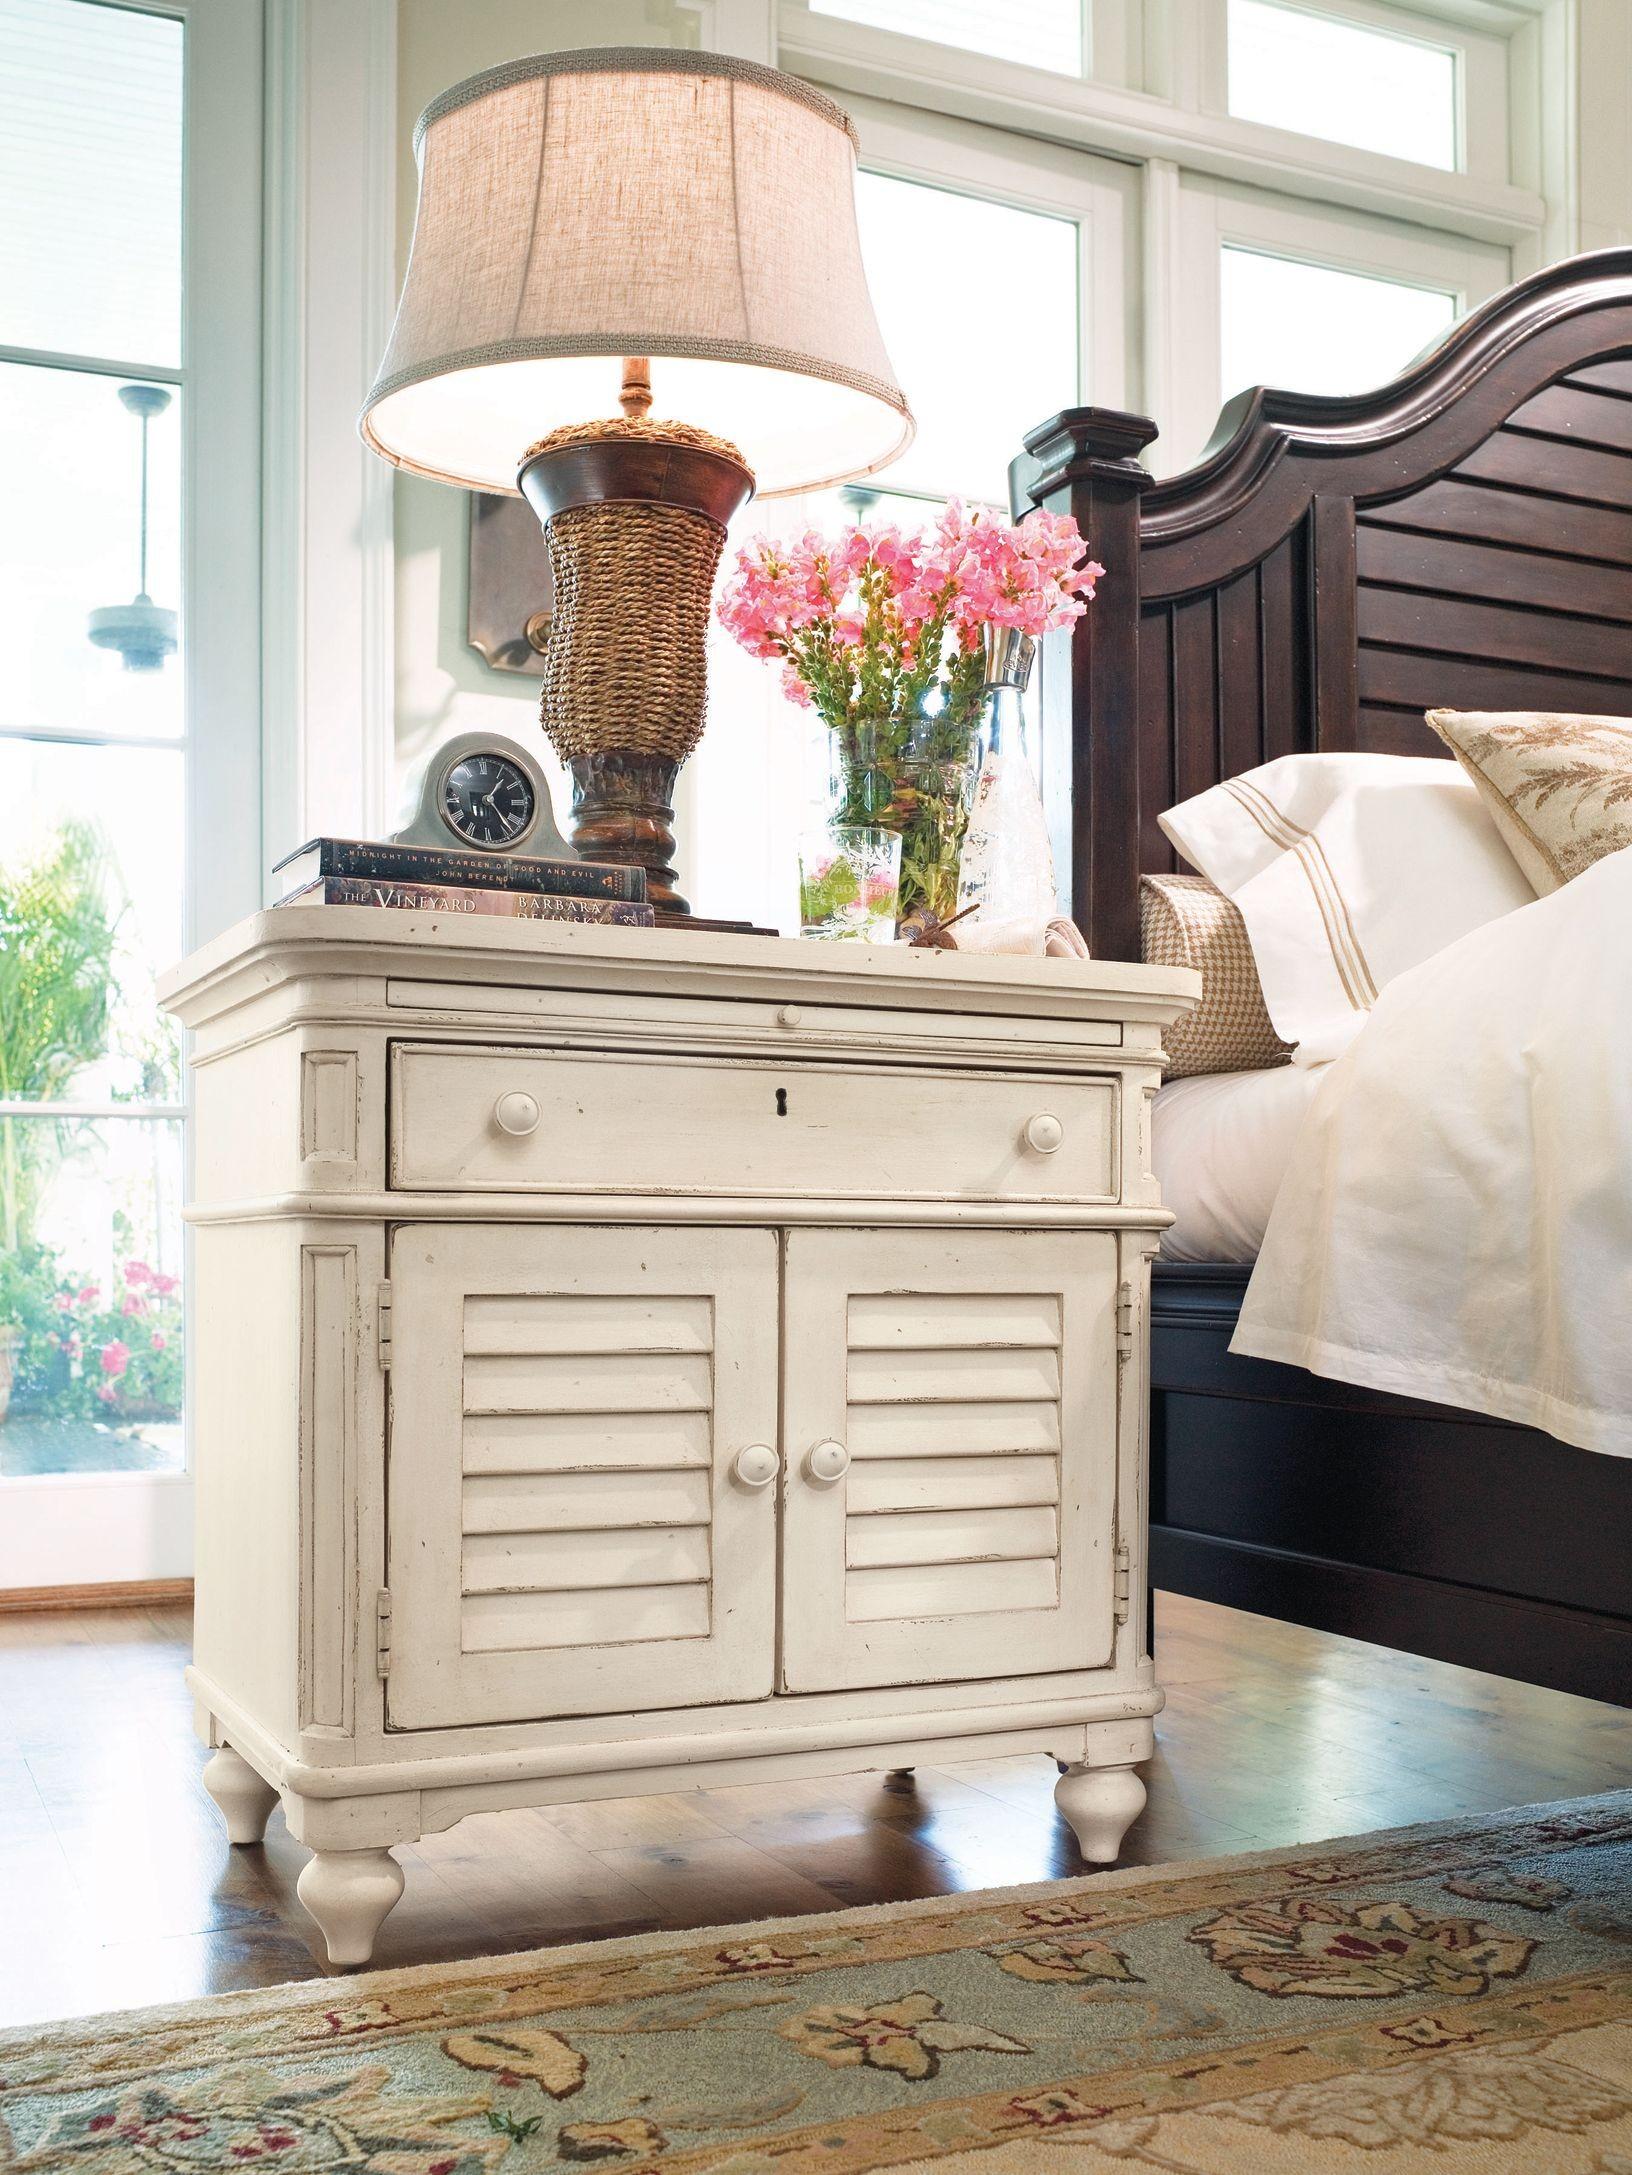 Paula Deen Home Linen Magnolia Bedroom Set From Paula Deen 996210b Coleman Furniture